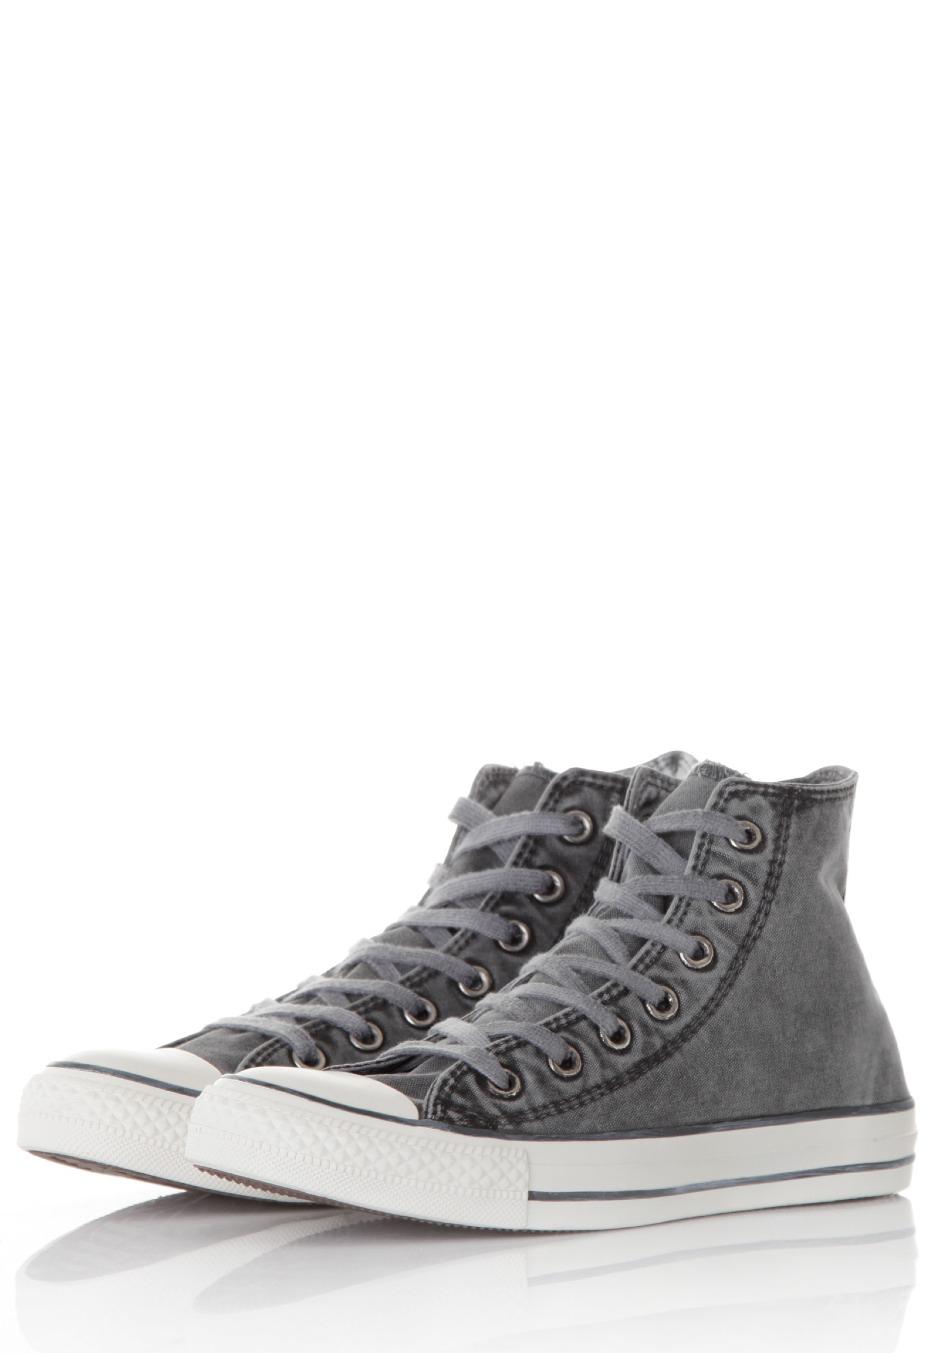 807c90a9fde4 ... Converse - Chuck Taylor All Star Hi Converse Black - Girl Shoes ...